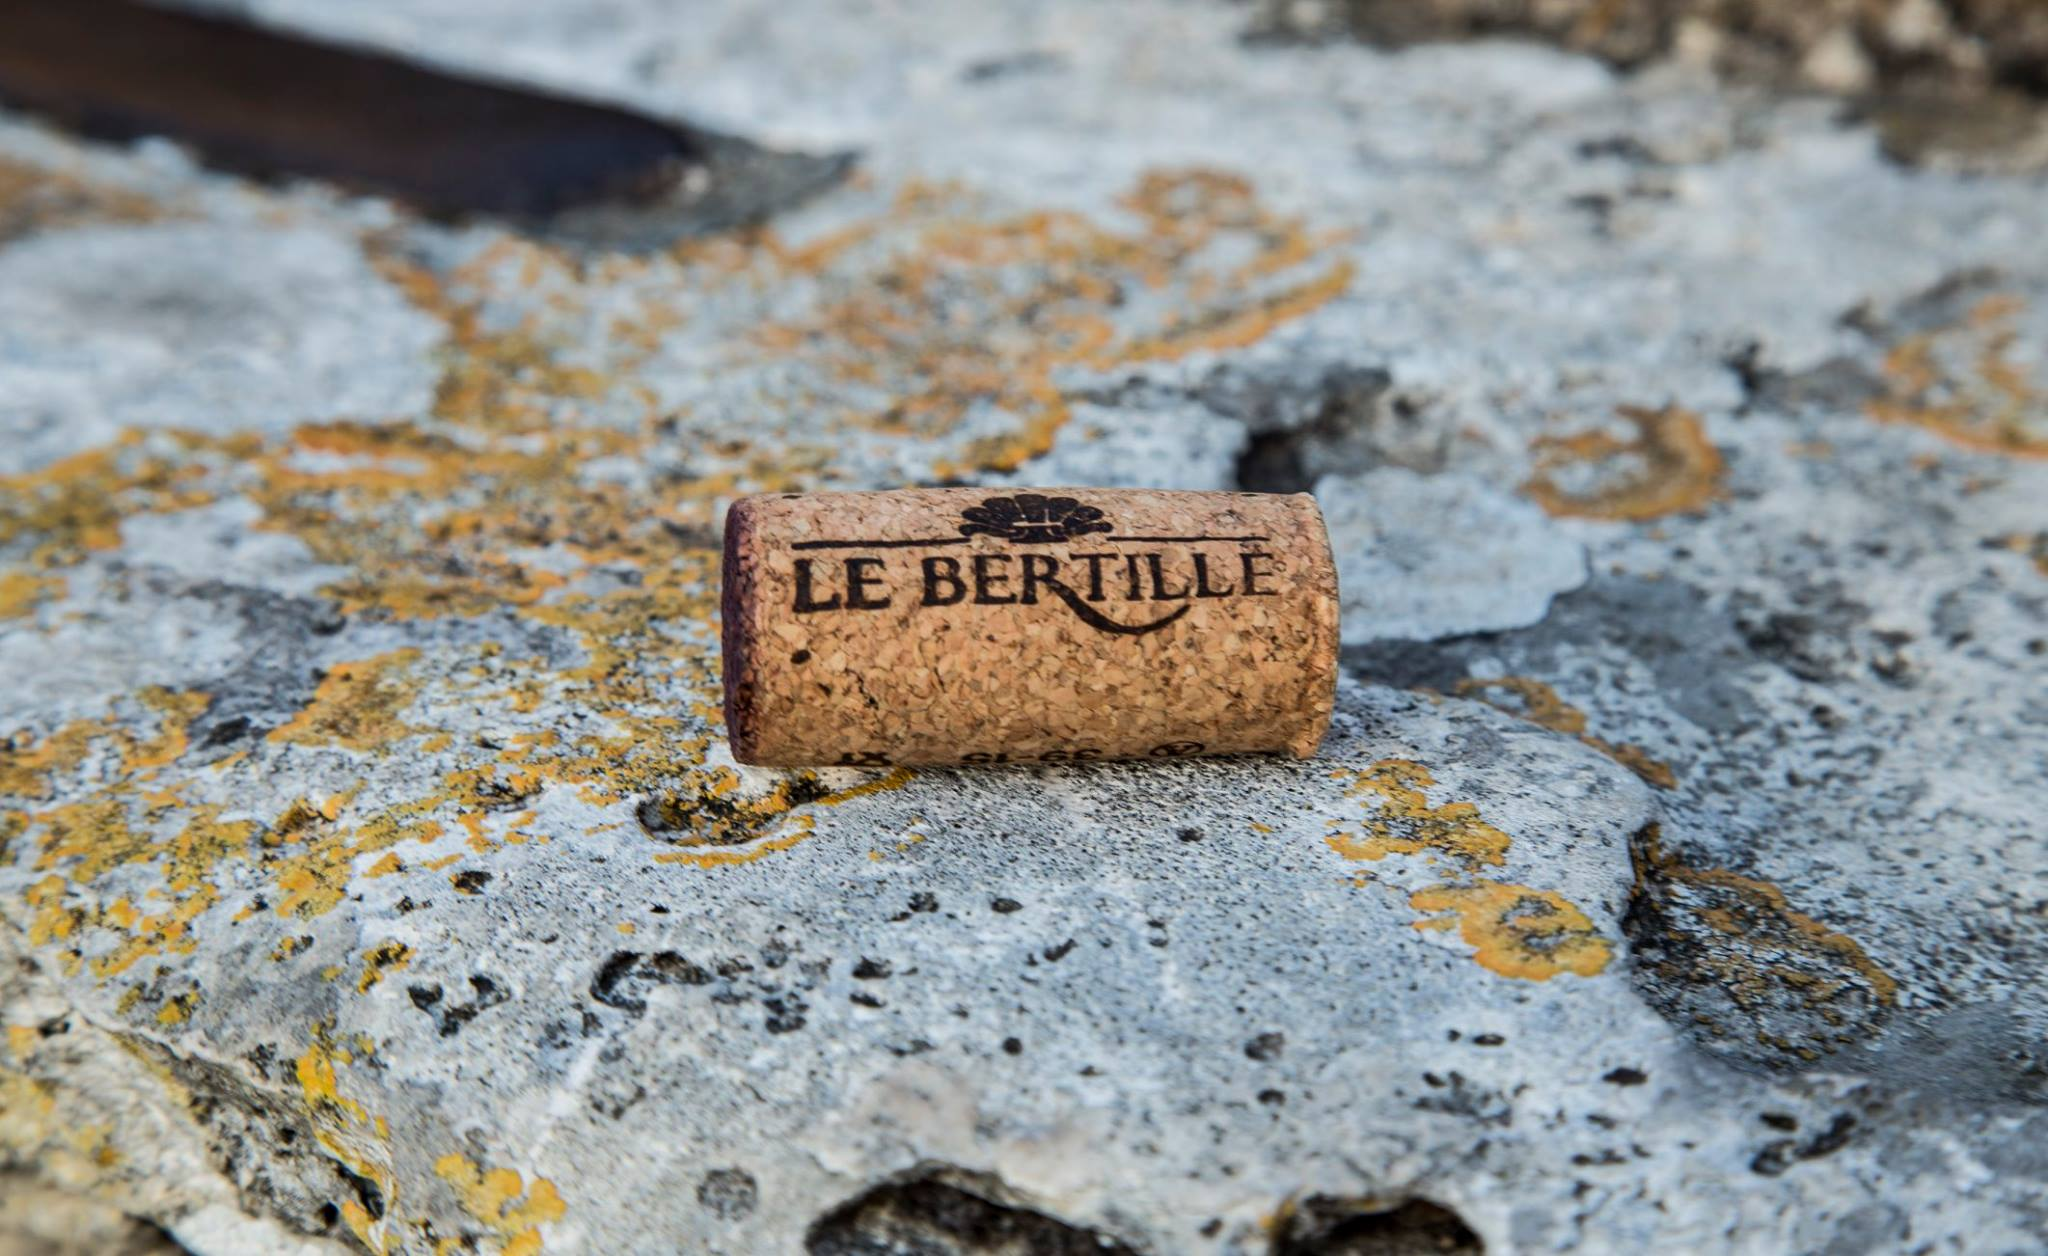 © Le Bertille